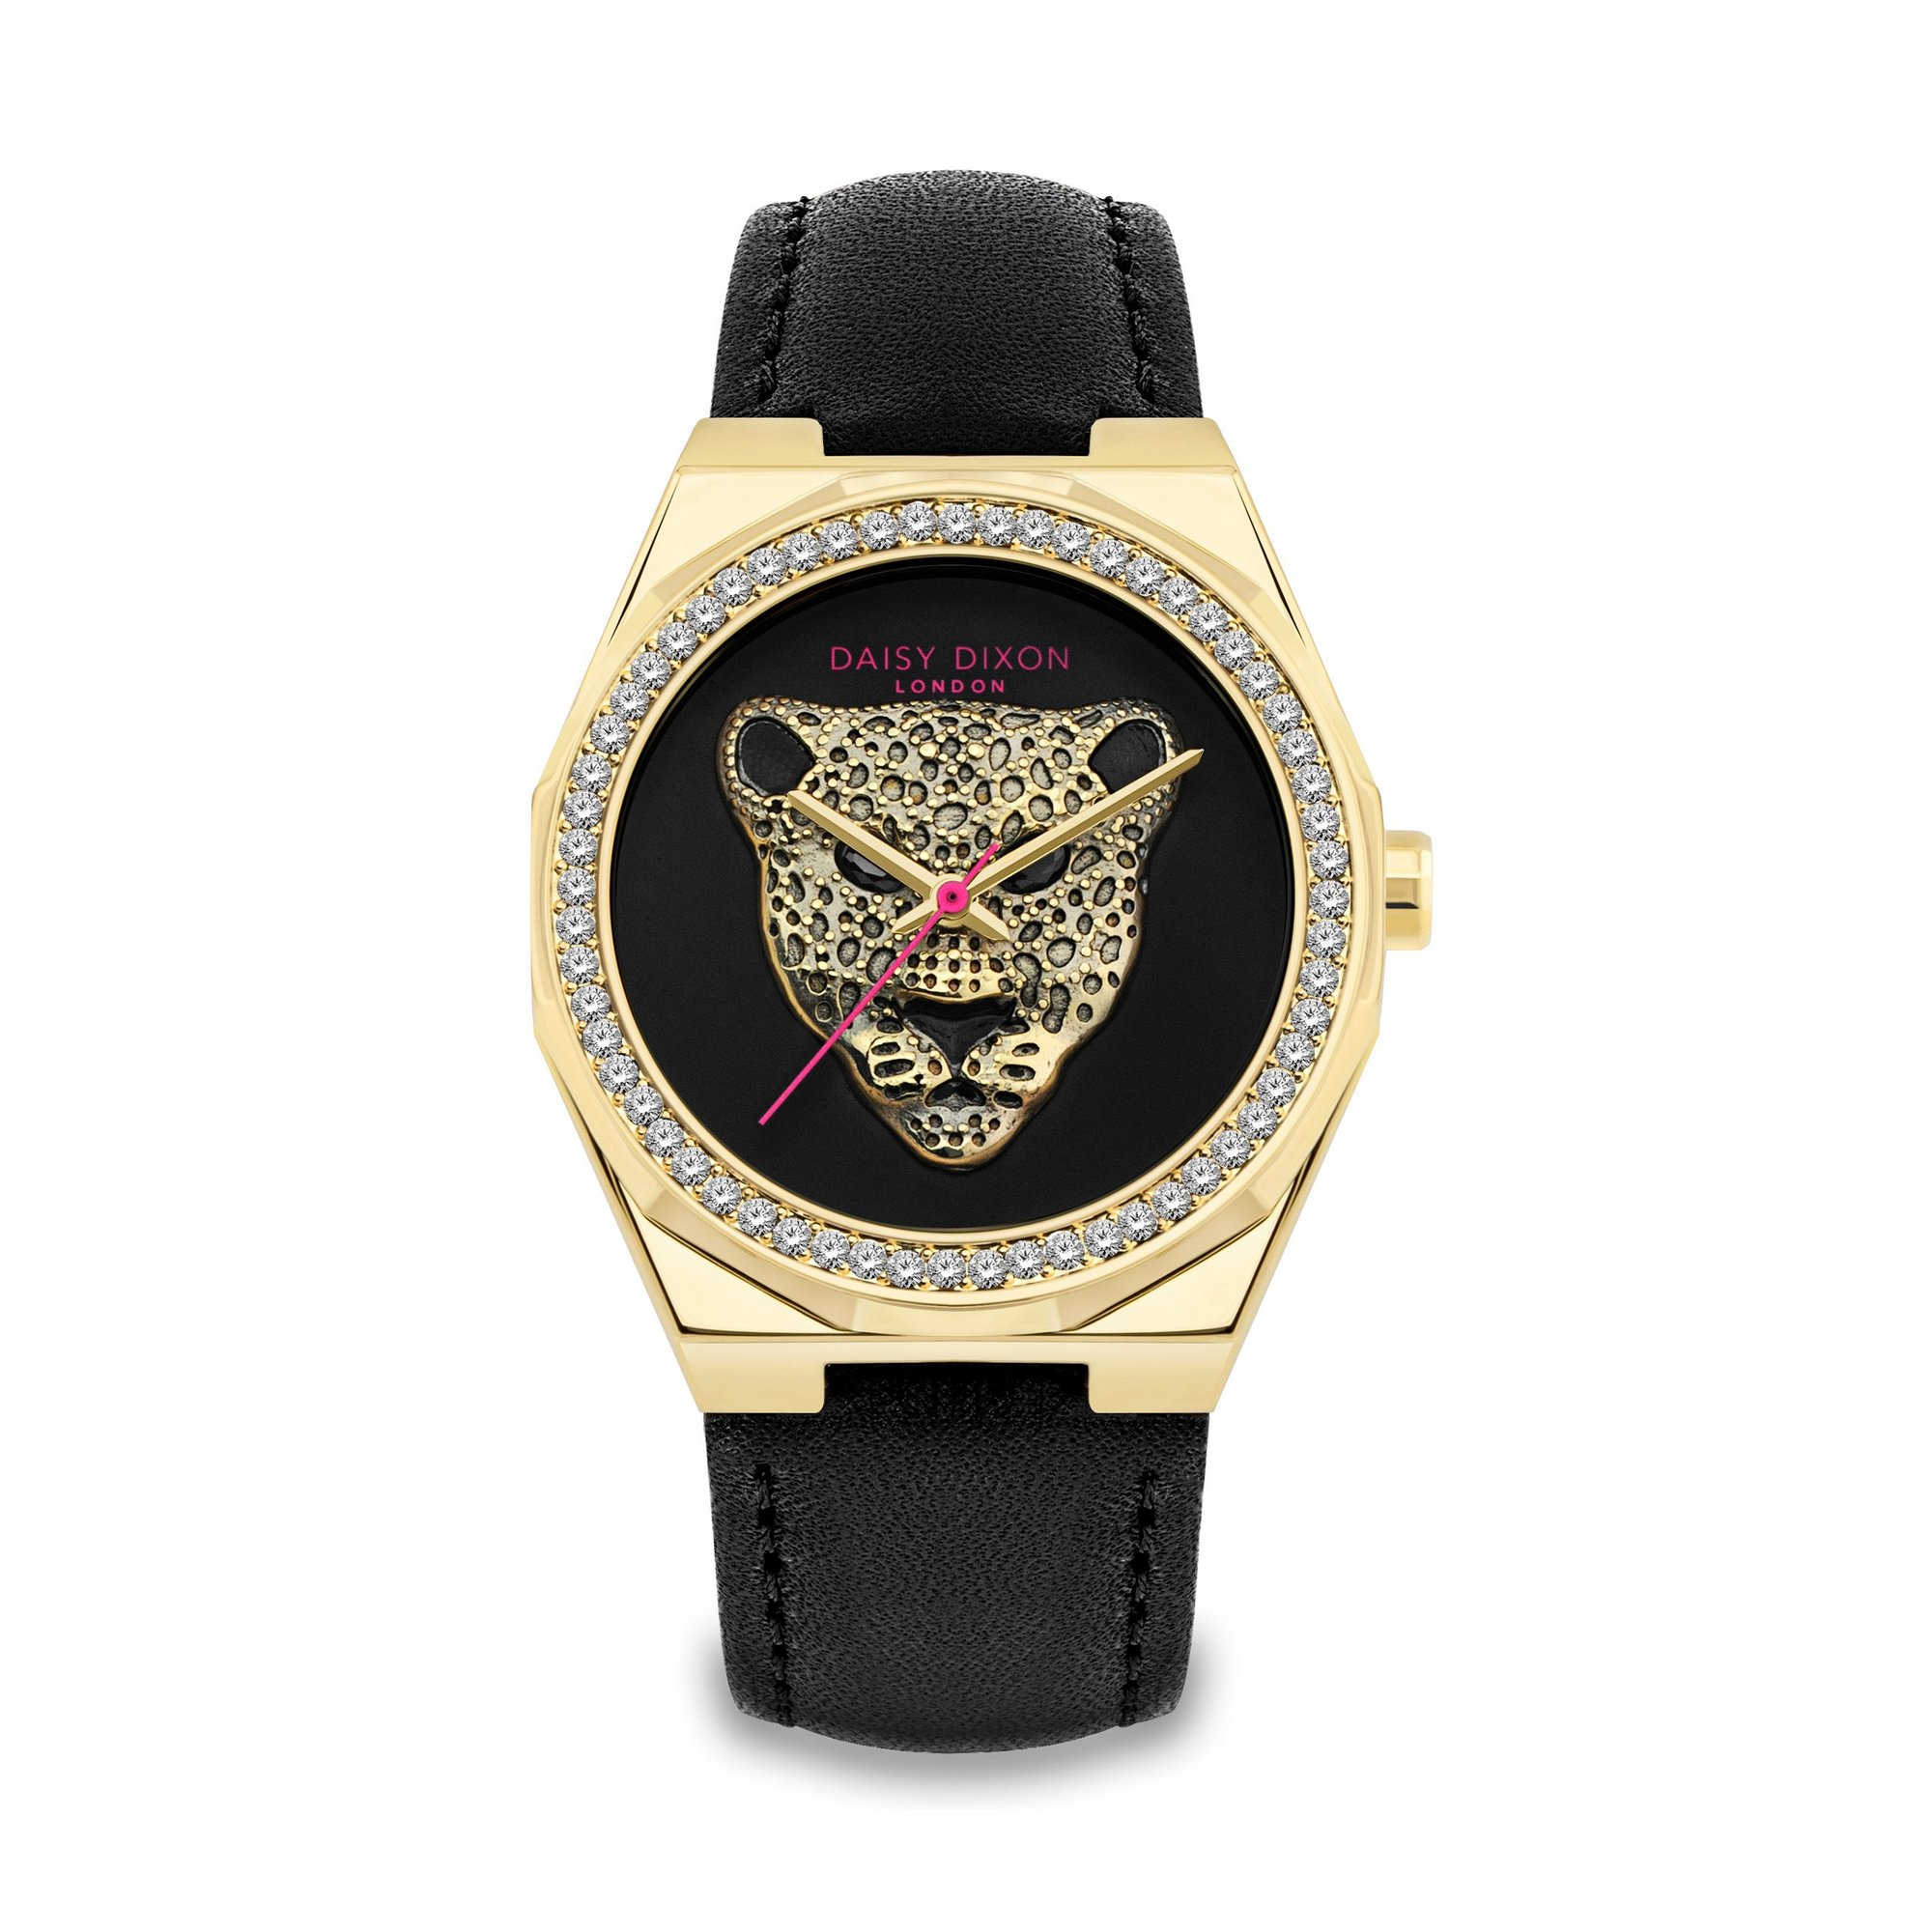 Image of Daisy Dixon Alessandra Black Strap Watch